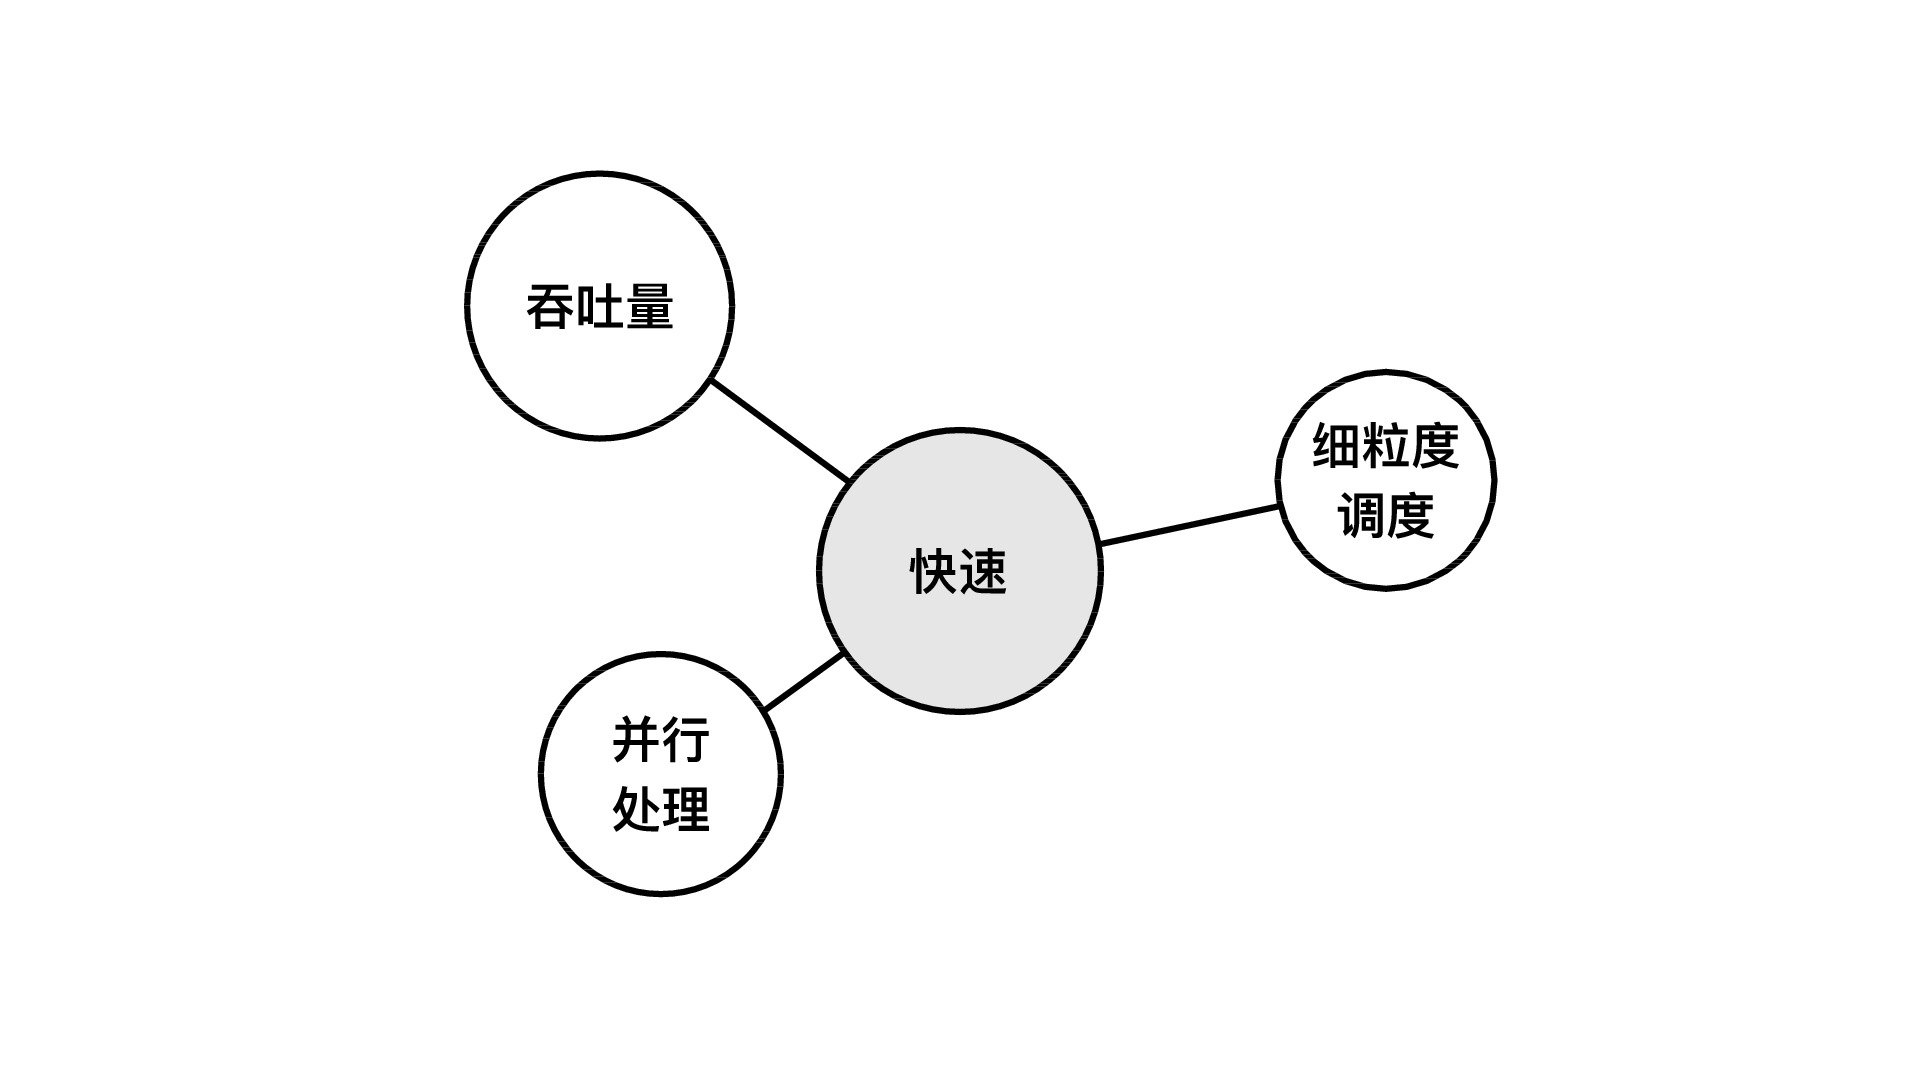 https://opentalk-blog.b0.upaiyun.com/prod/2018-07-28/b325d6b352bd461b2b2b2d970d264cfa